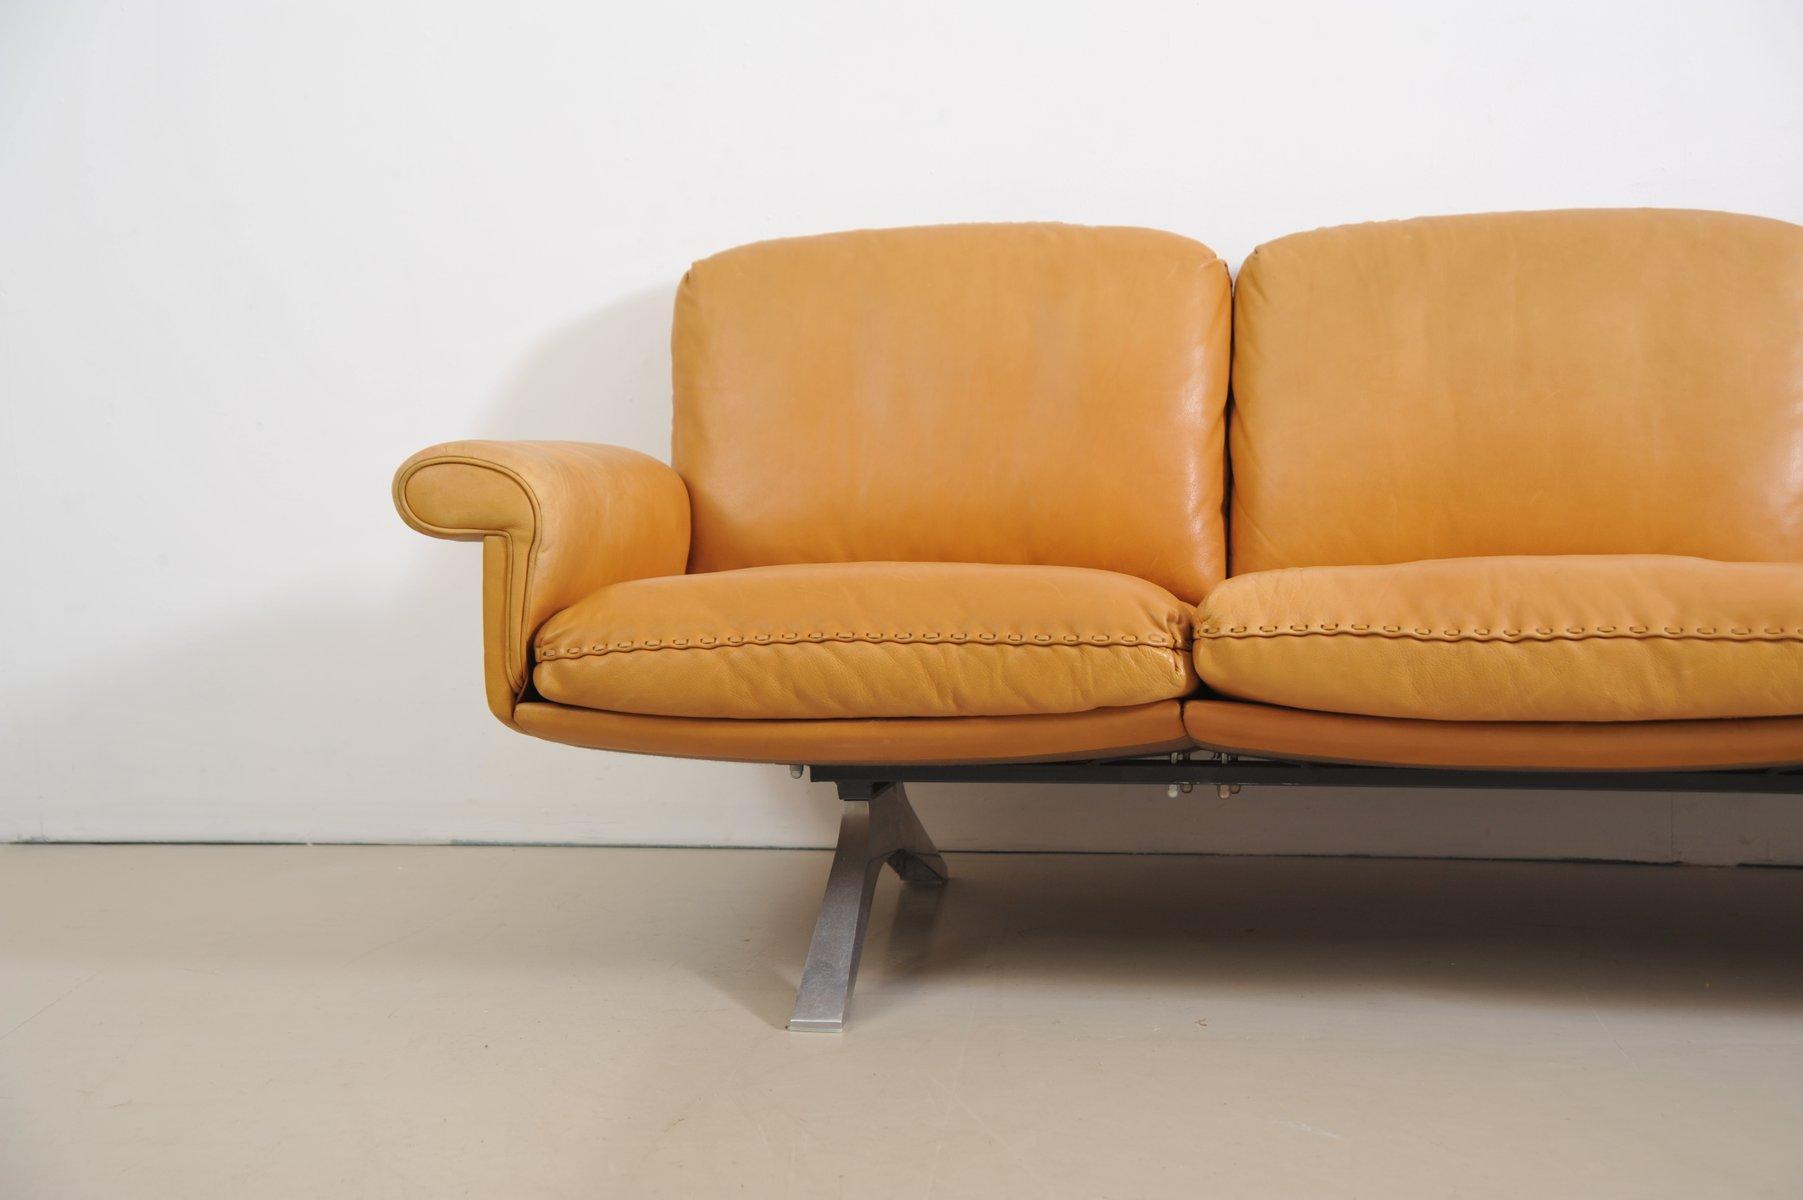 vintage ds 31 sofa von de sede bei pamono kaufen. Black Bedroom Furniture Sets. Home Design Ideas